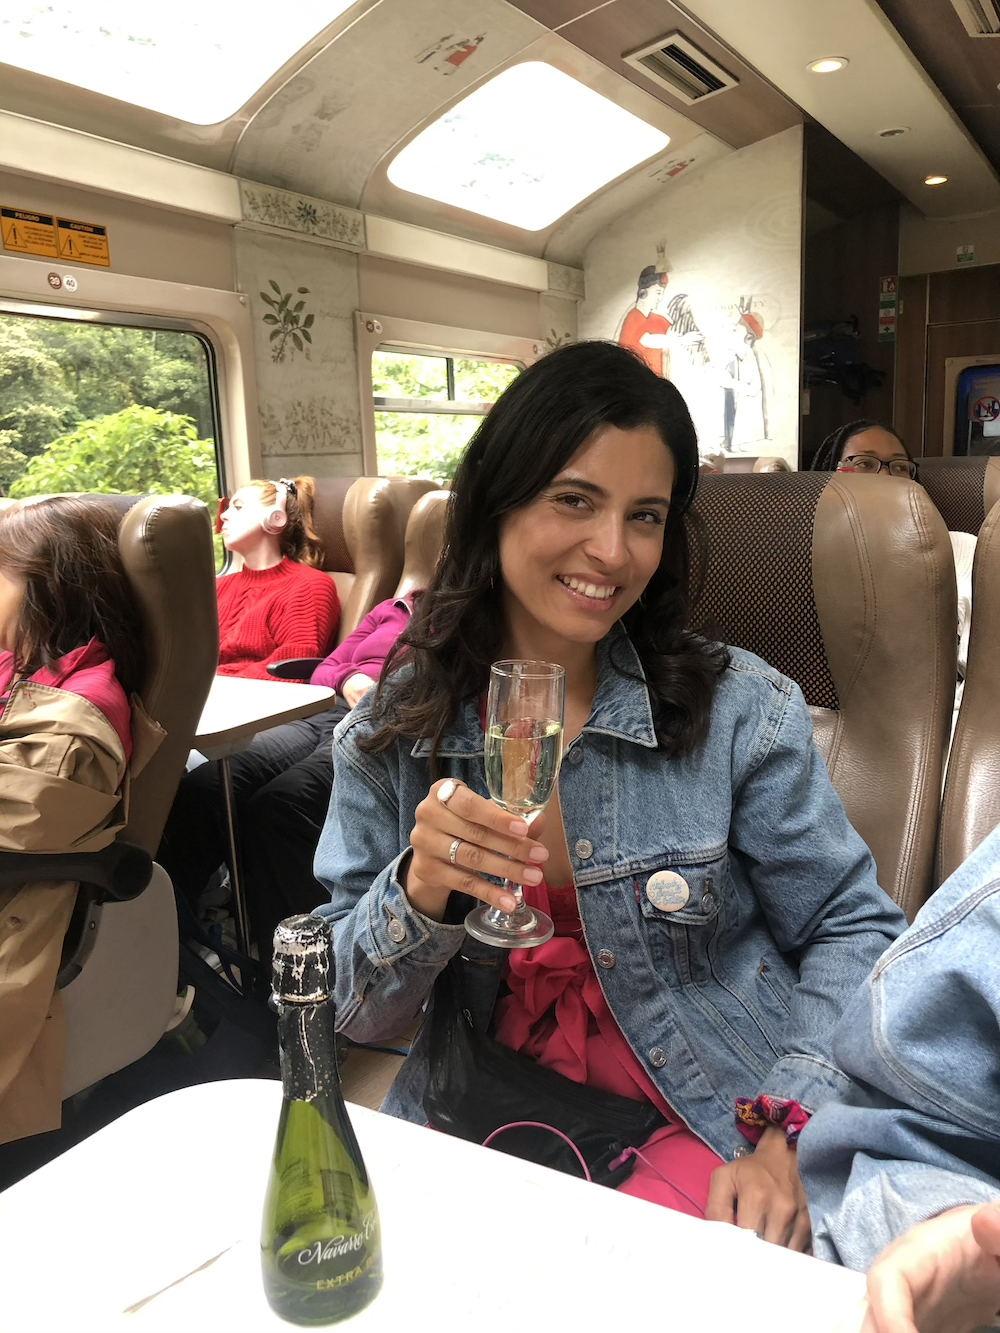 woman drinking sparking wine on machu picchu train